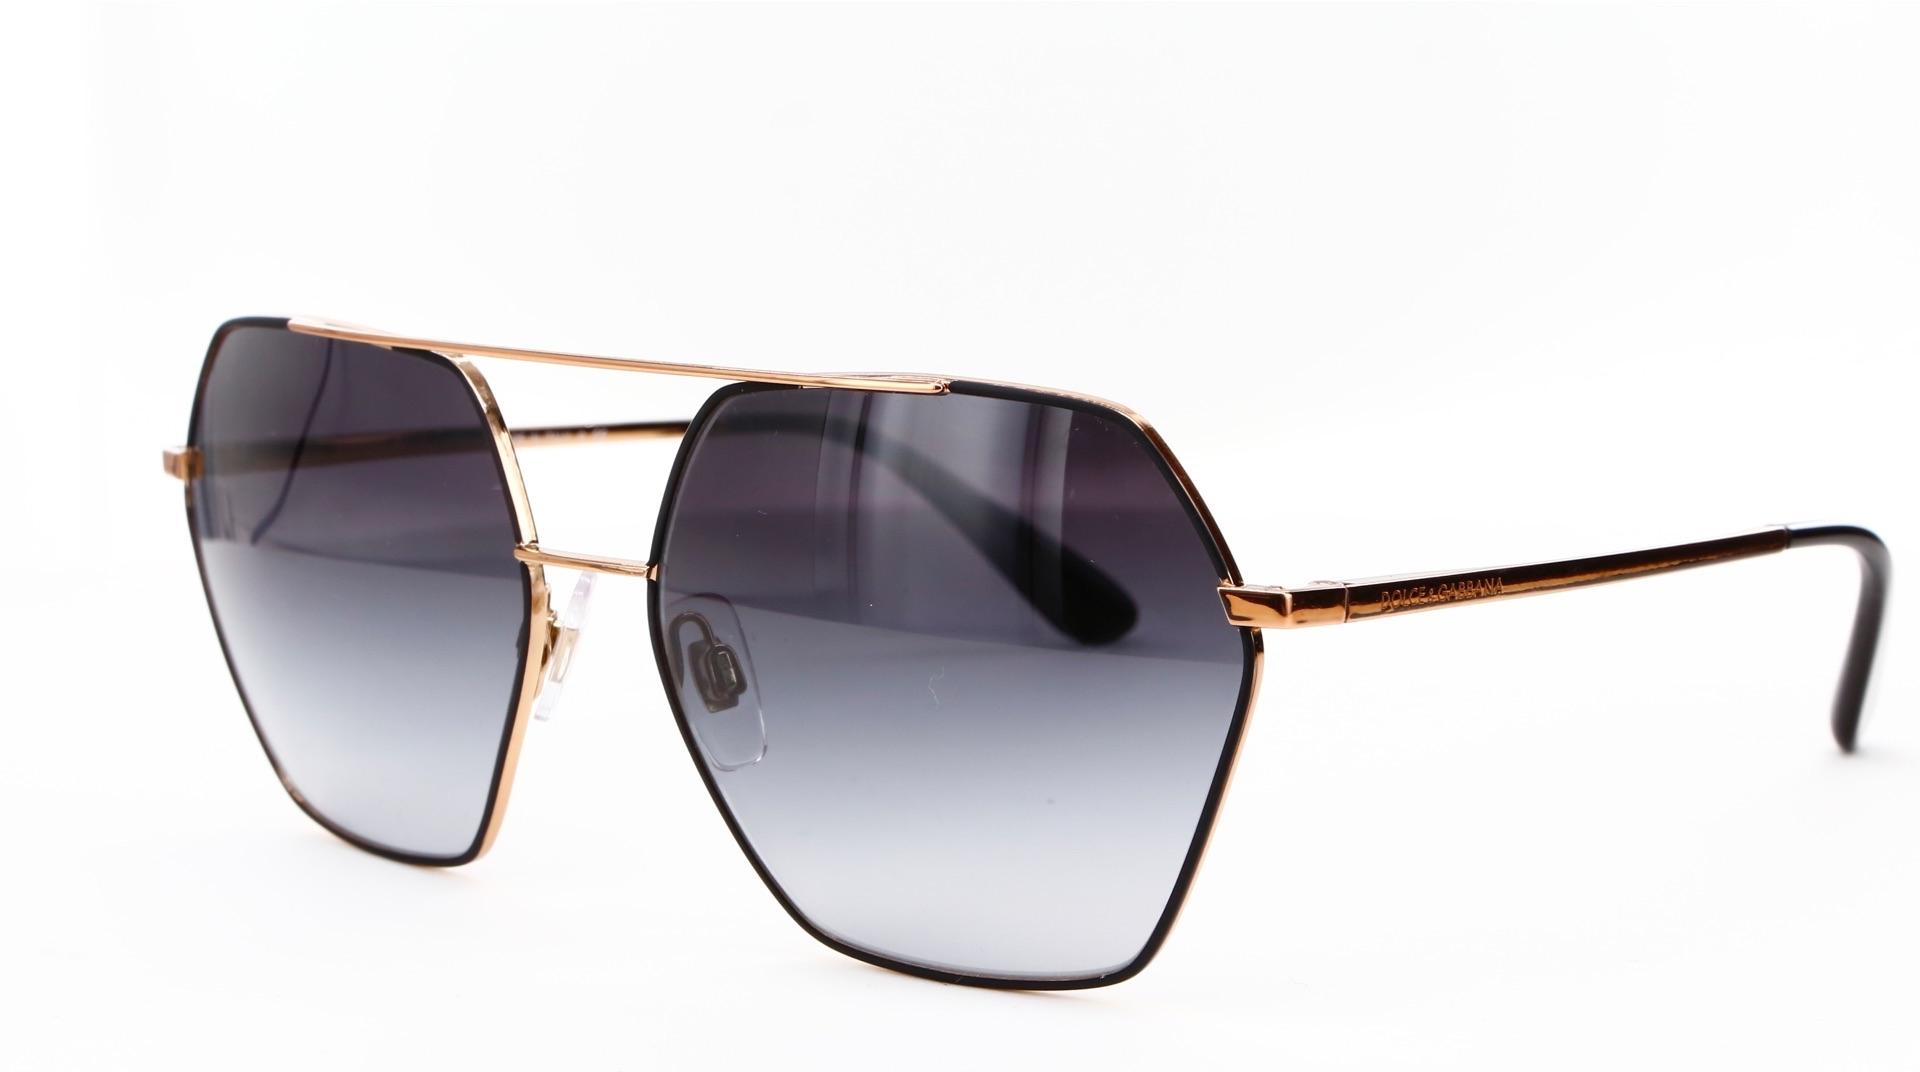 Dolce & Gabbana - ref: 79390